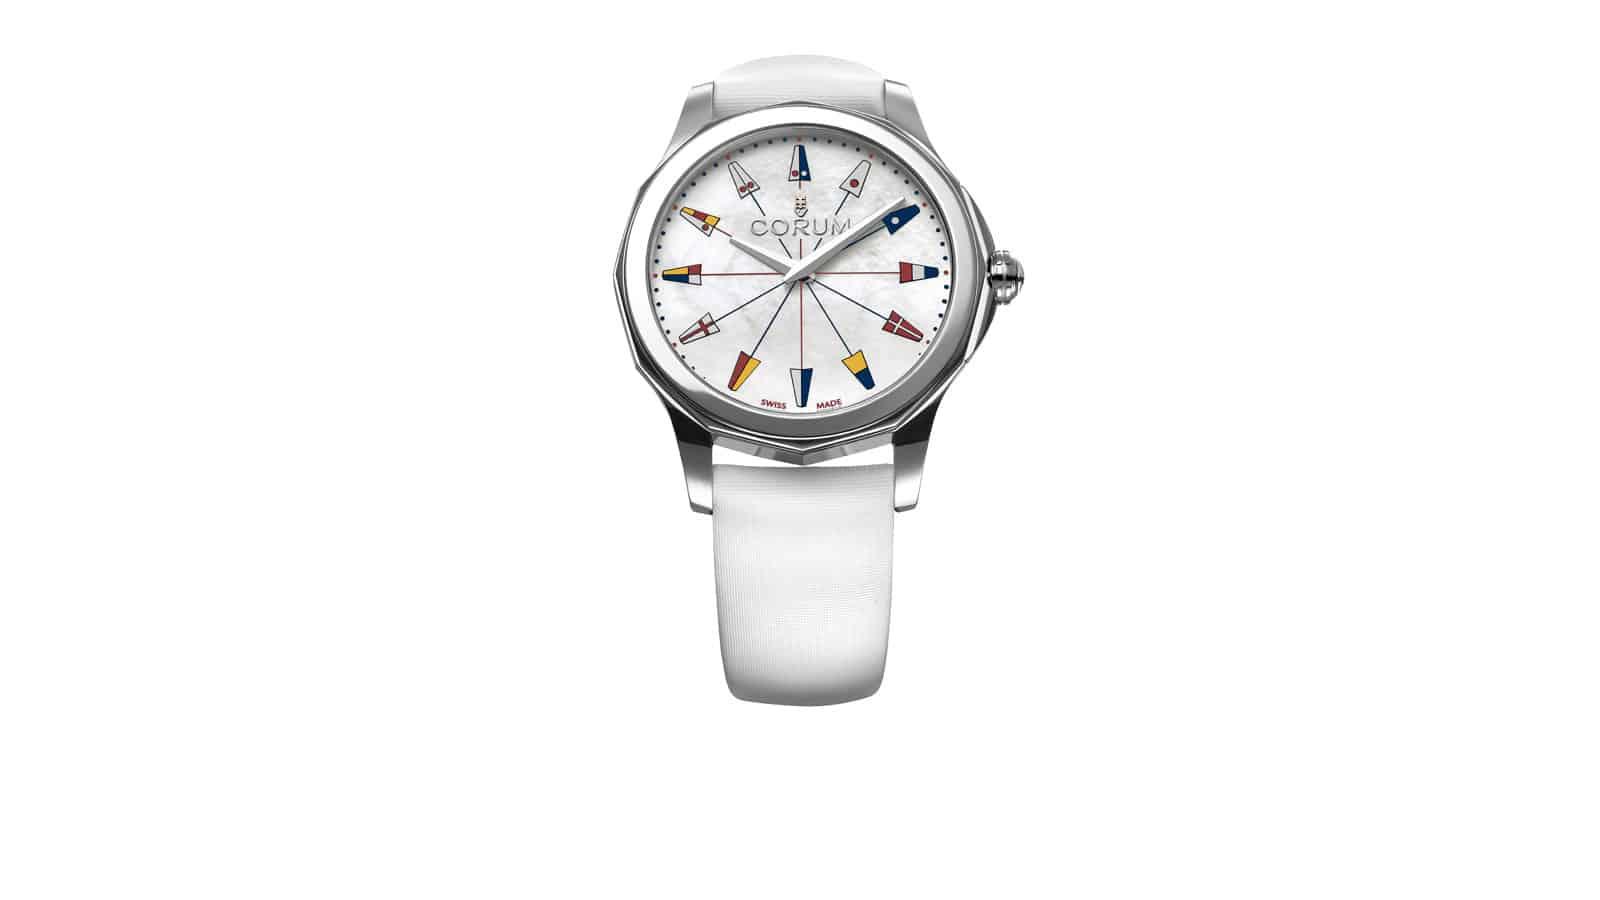 Corum-Admirals-cup-lady-A020_02586-lionel-meylan-horlogerie-joaillerie-vevey